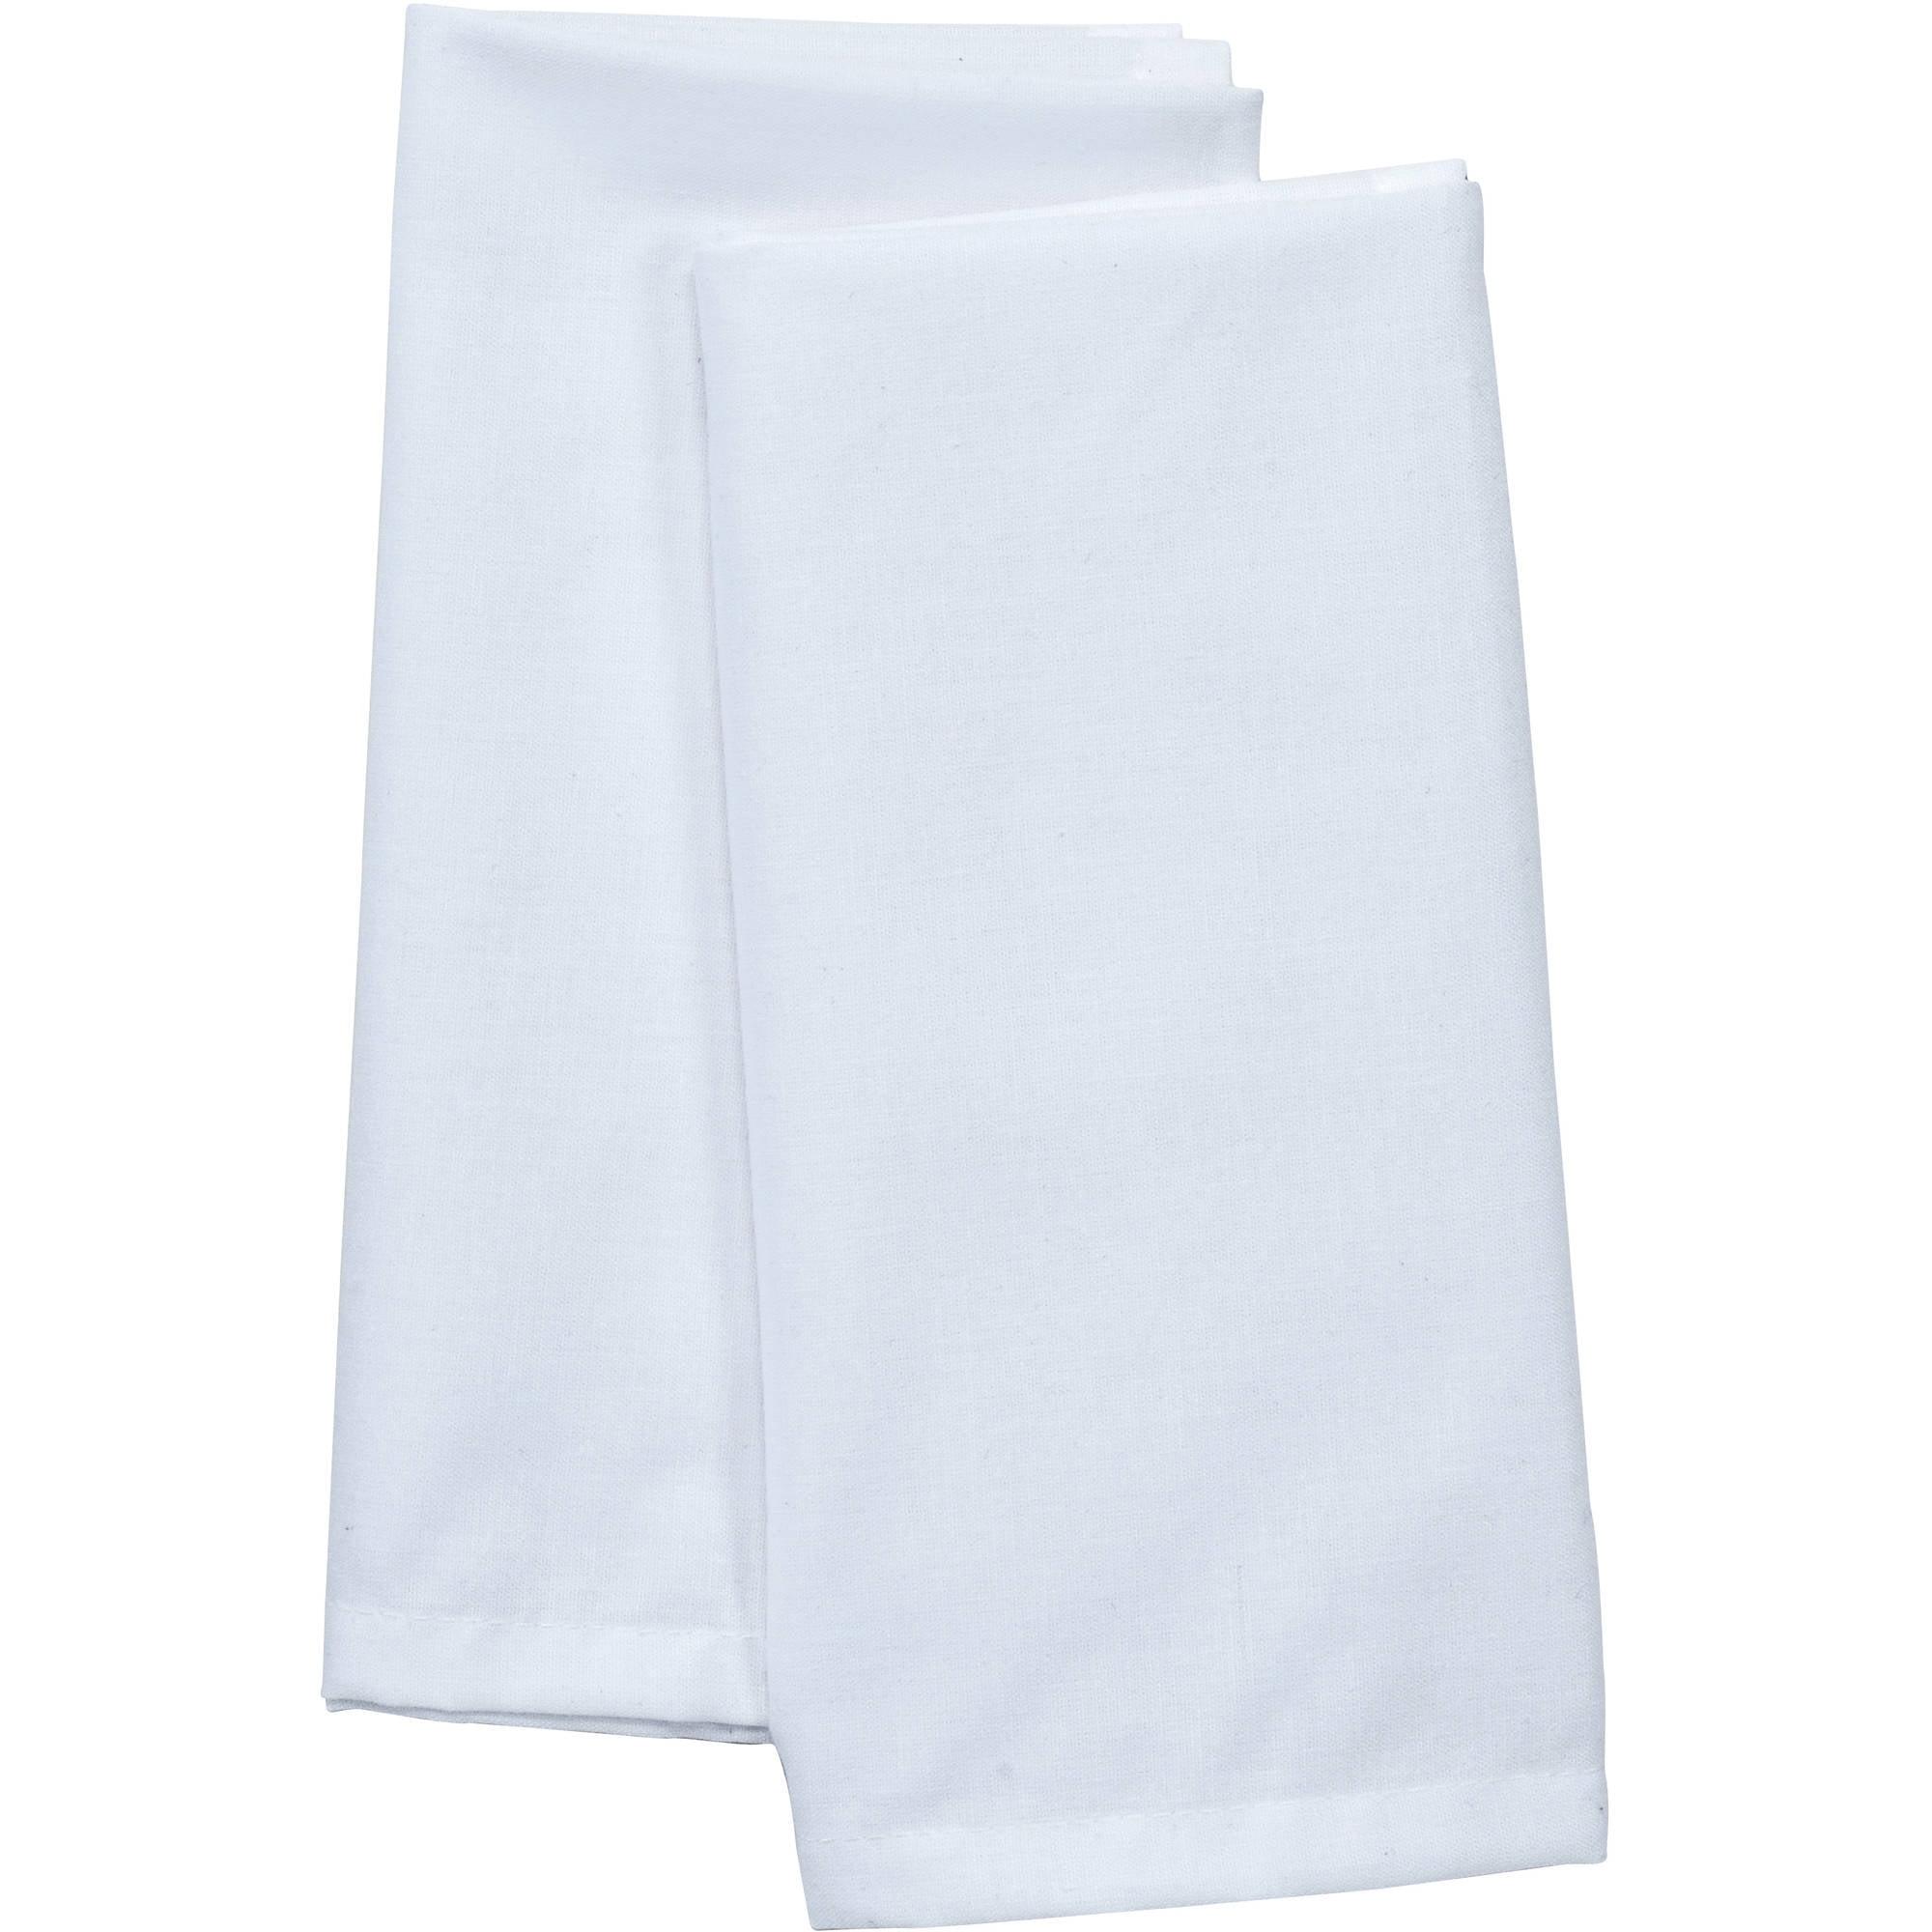 48 white restaurant dinner cloth linen napkins 20x20